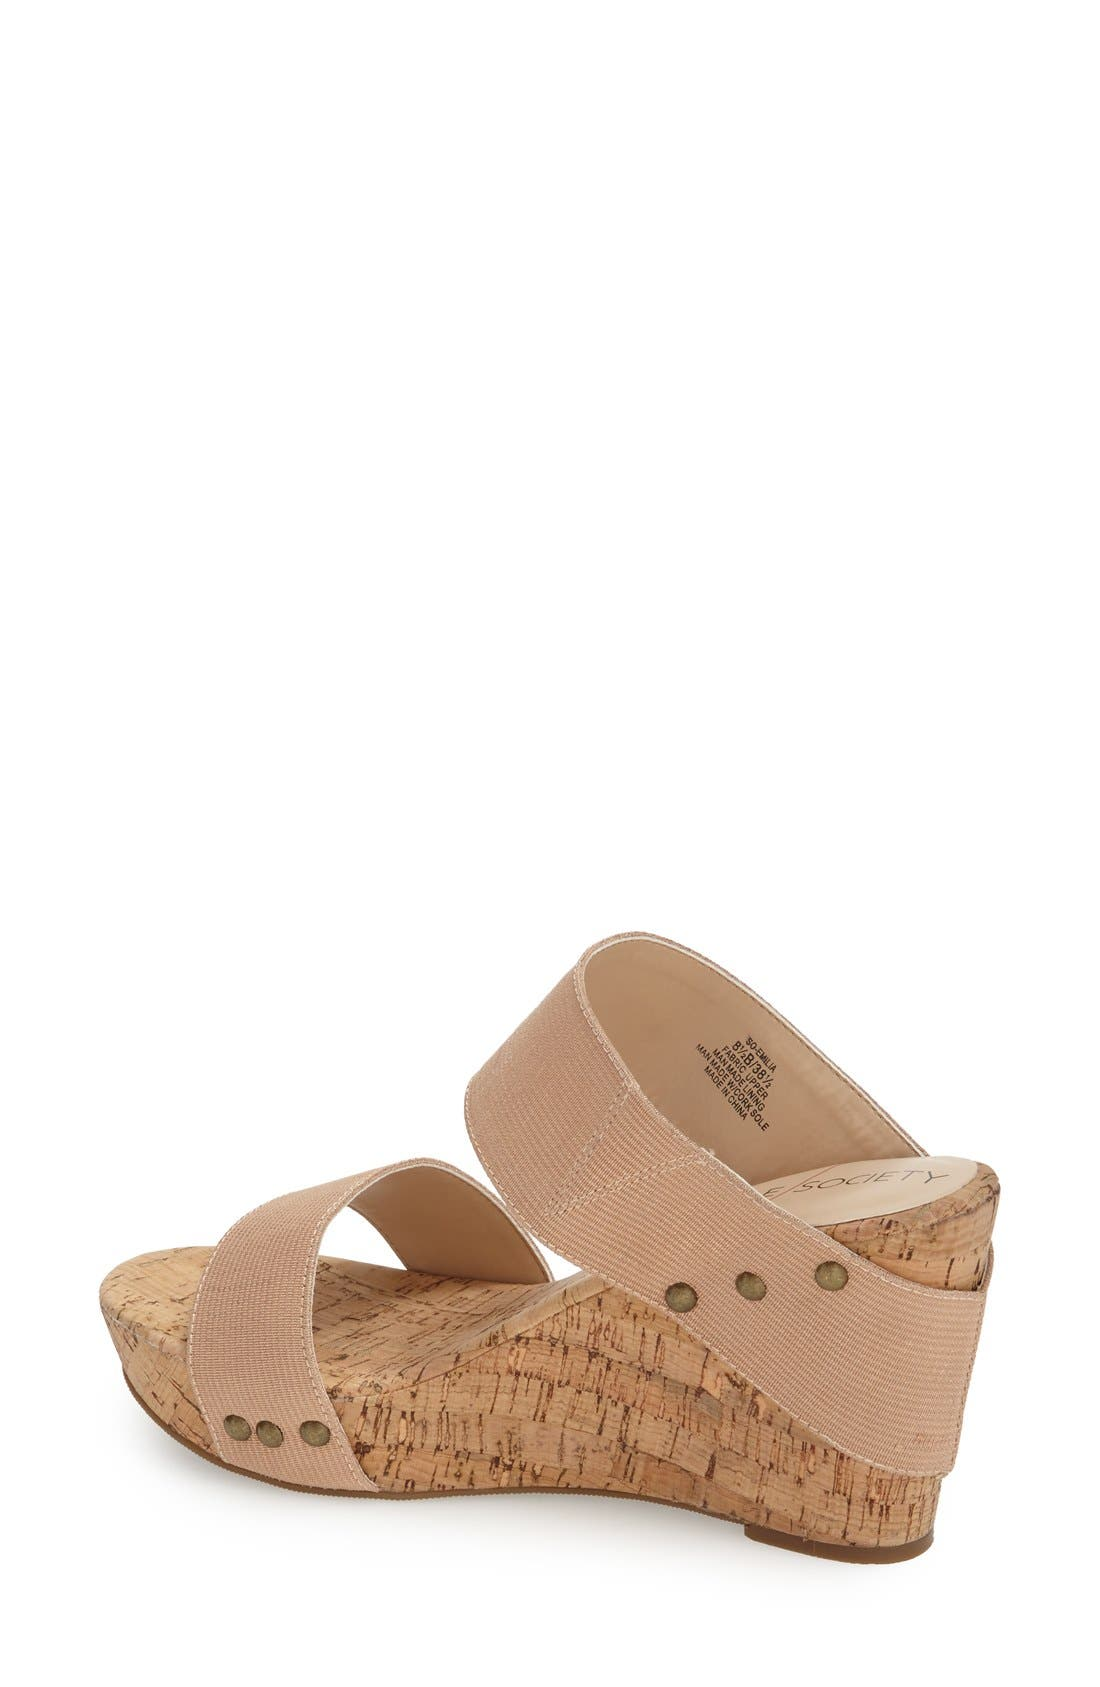 'Emilia 2' Wedge Sandal,                             Alternate thumbnail 2, color,                             Blush Champagne